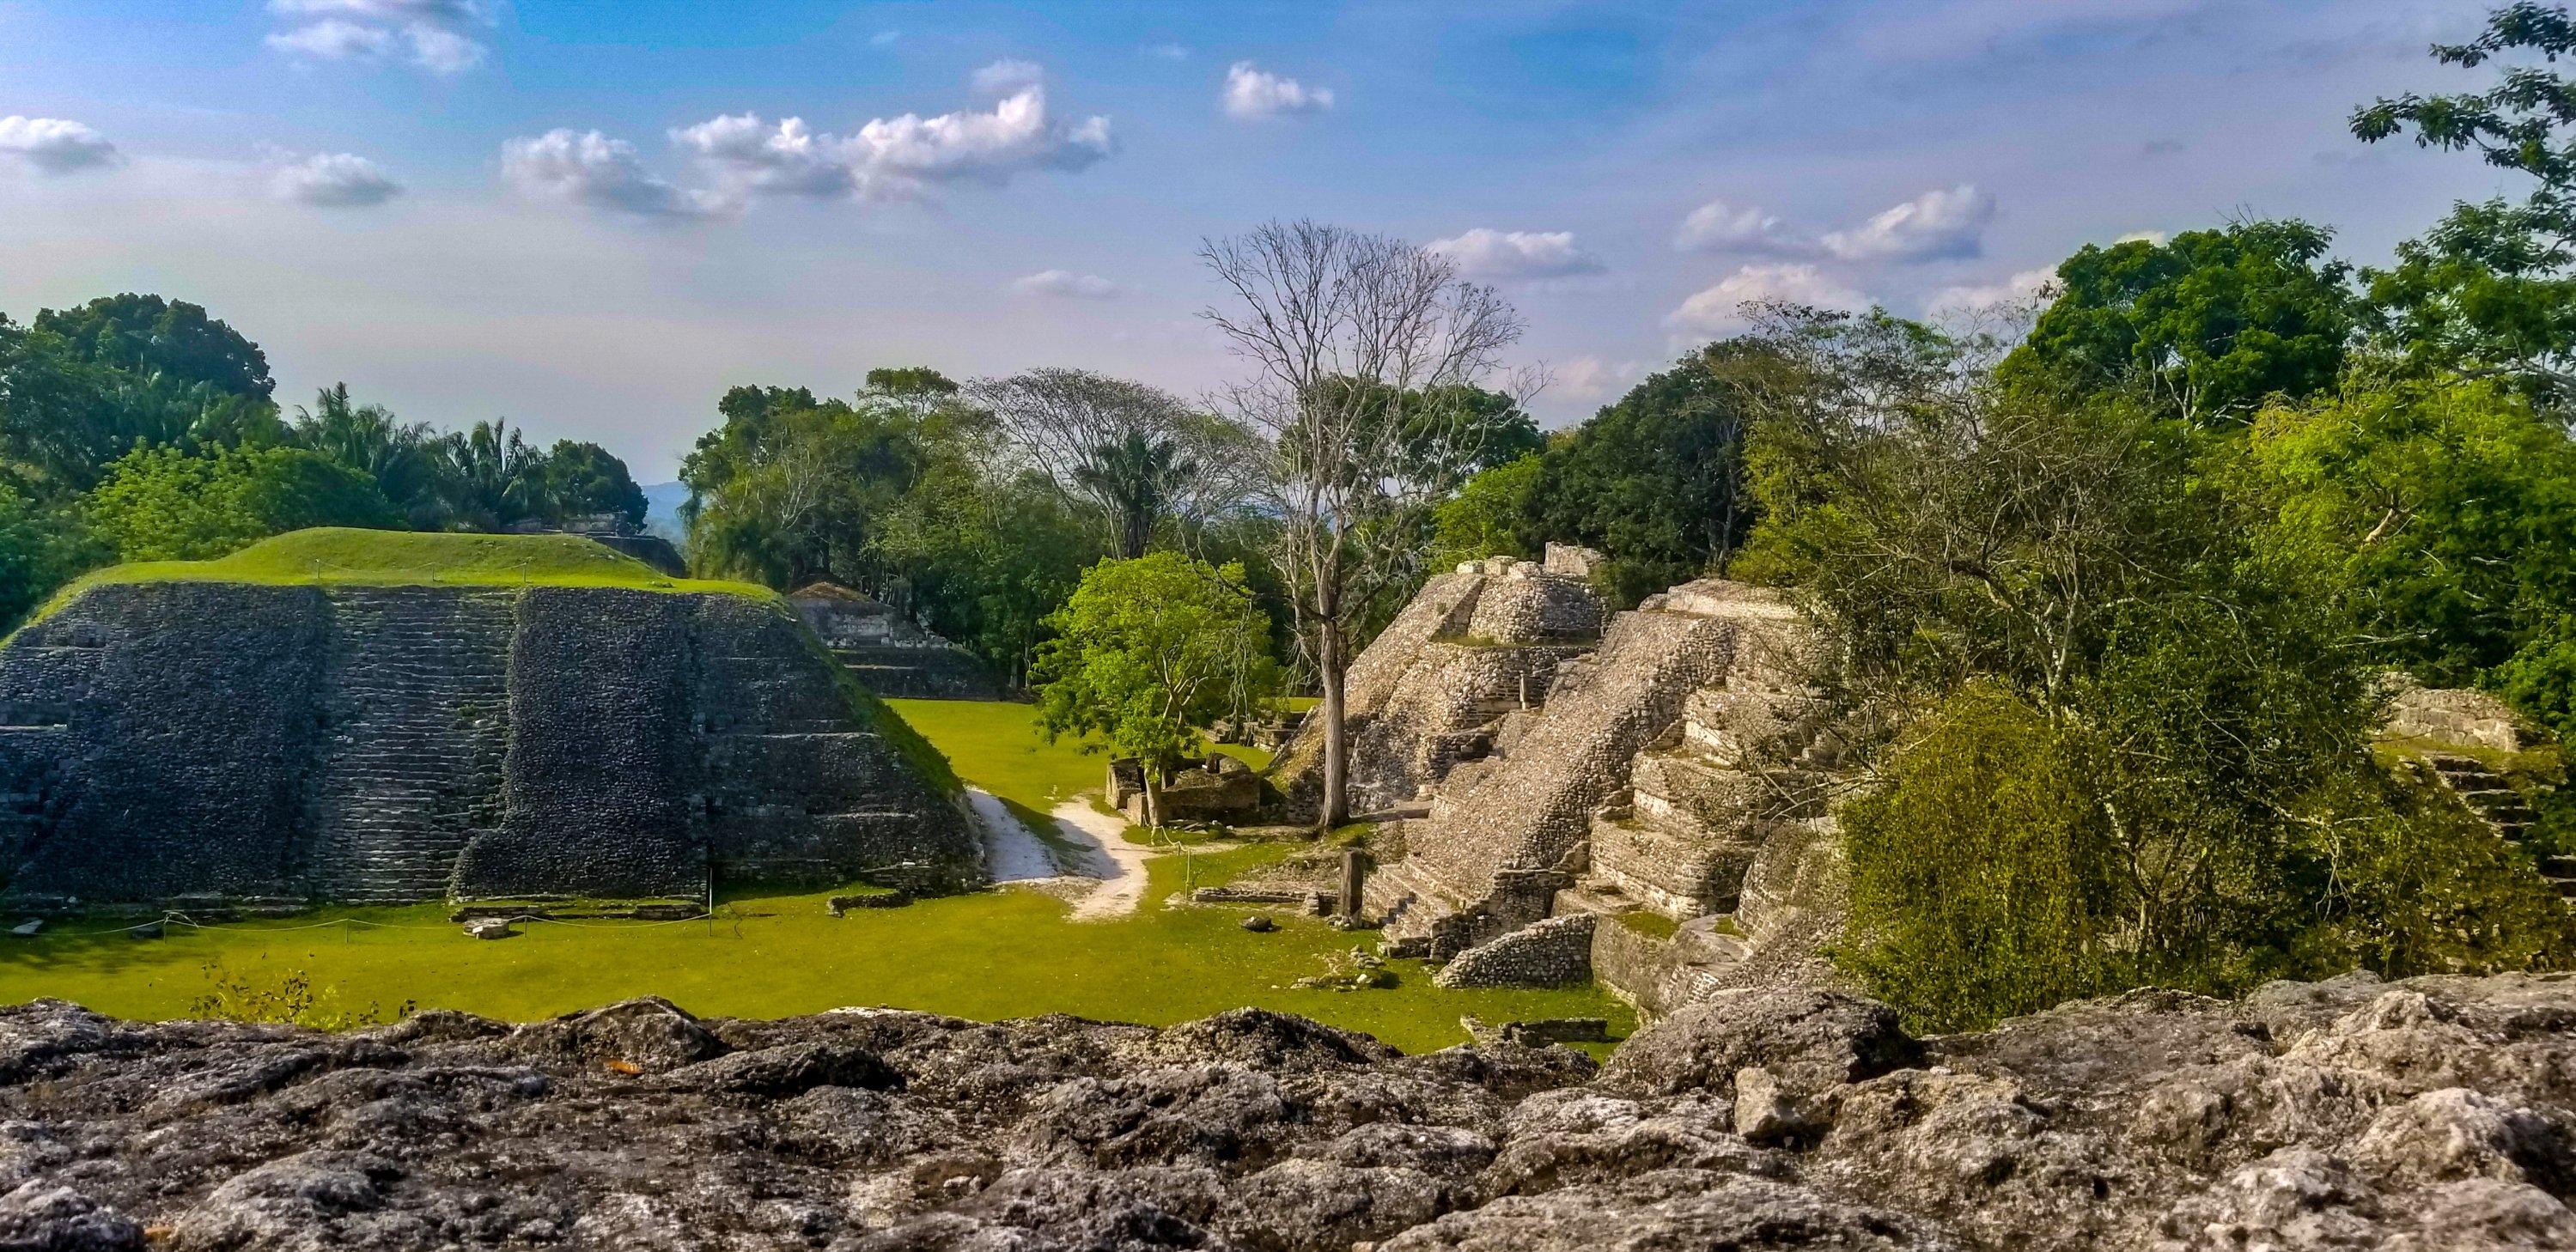 san ignacio belize xunantunitch maya ruins